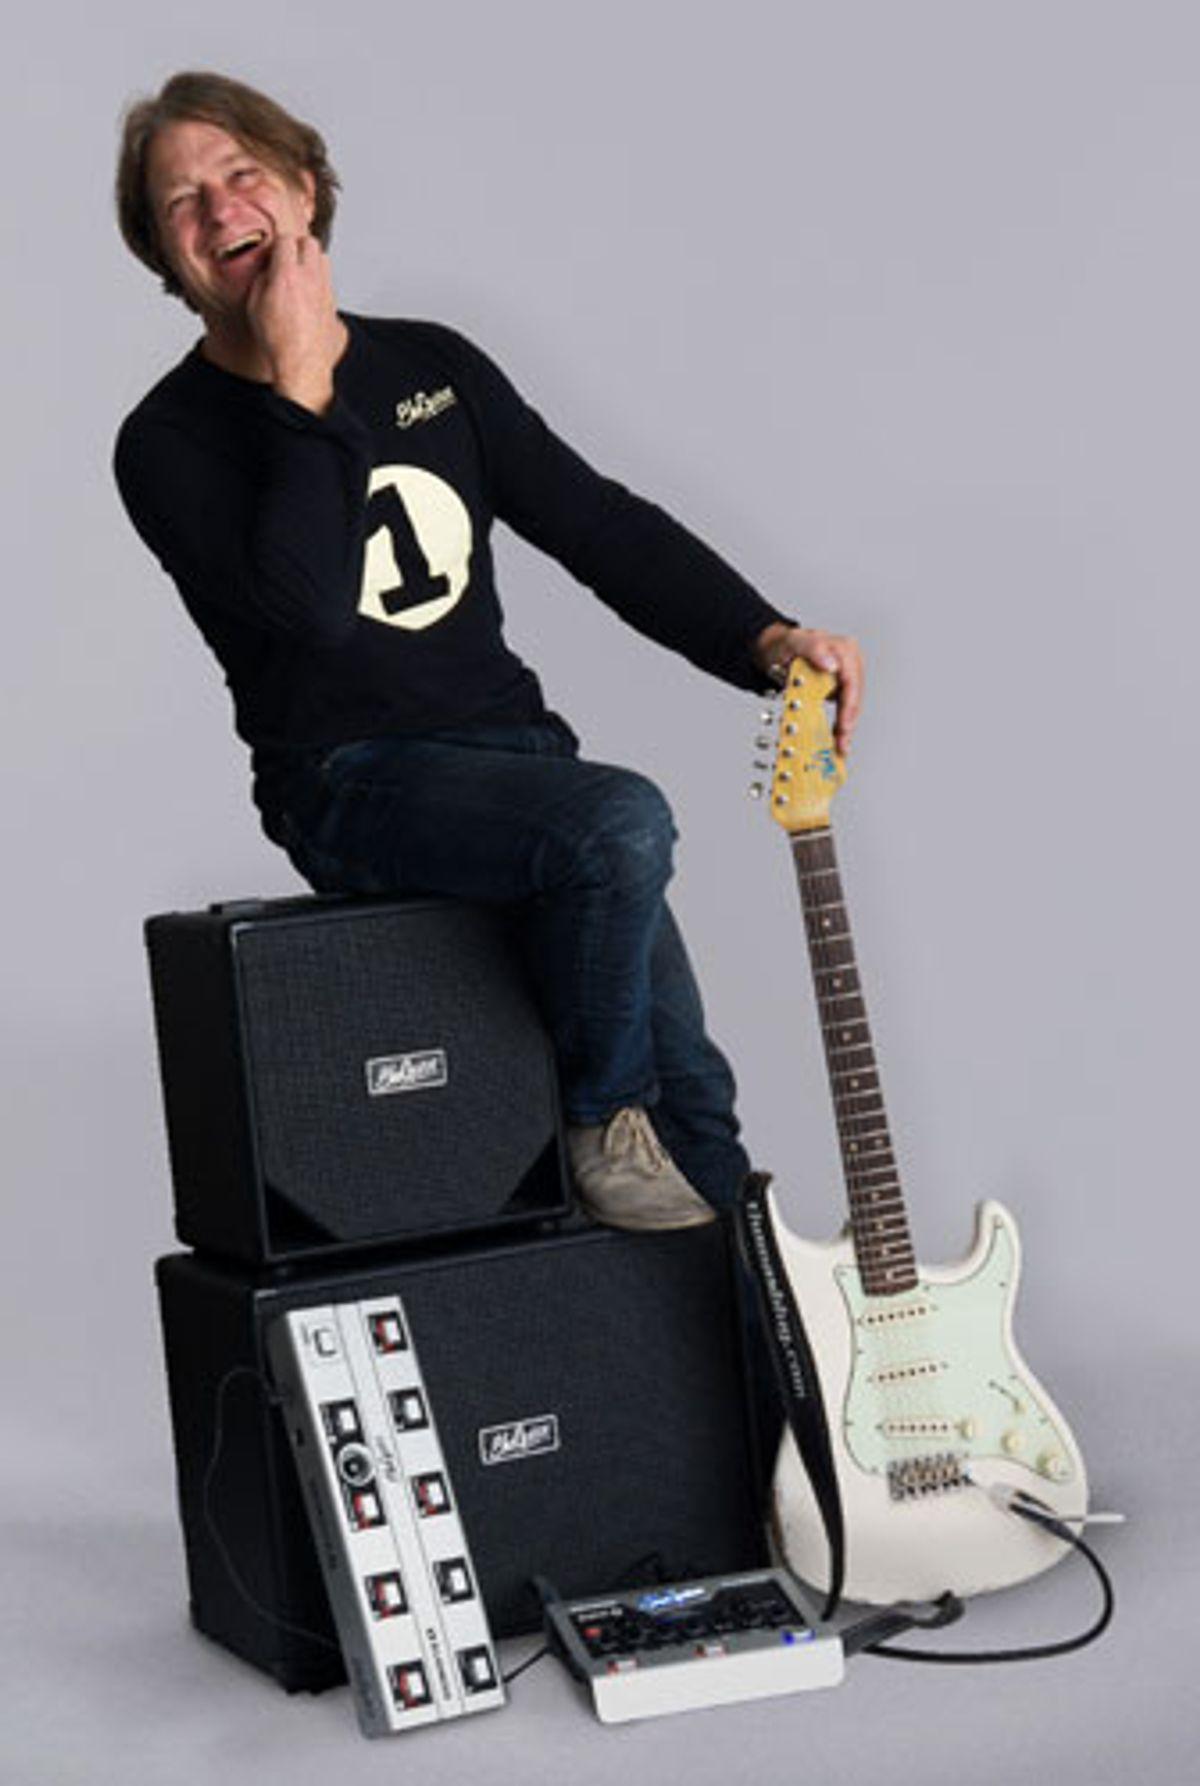 BluGuitar Unveils New Line of Guitar Cabinets